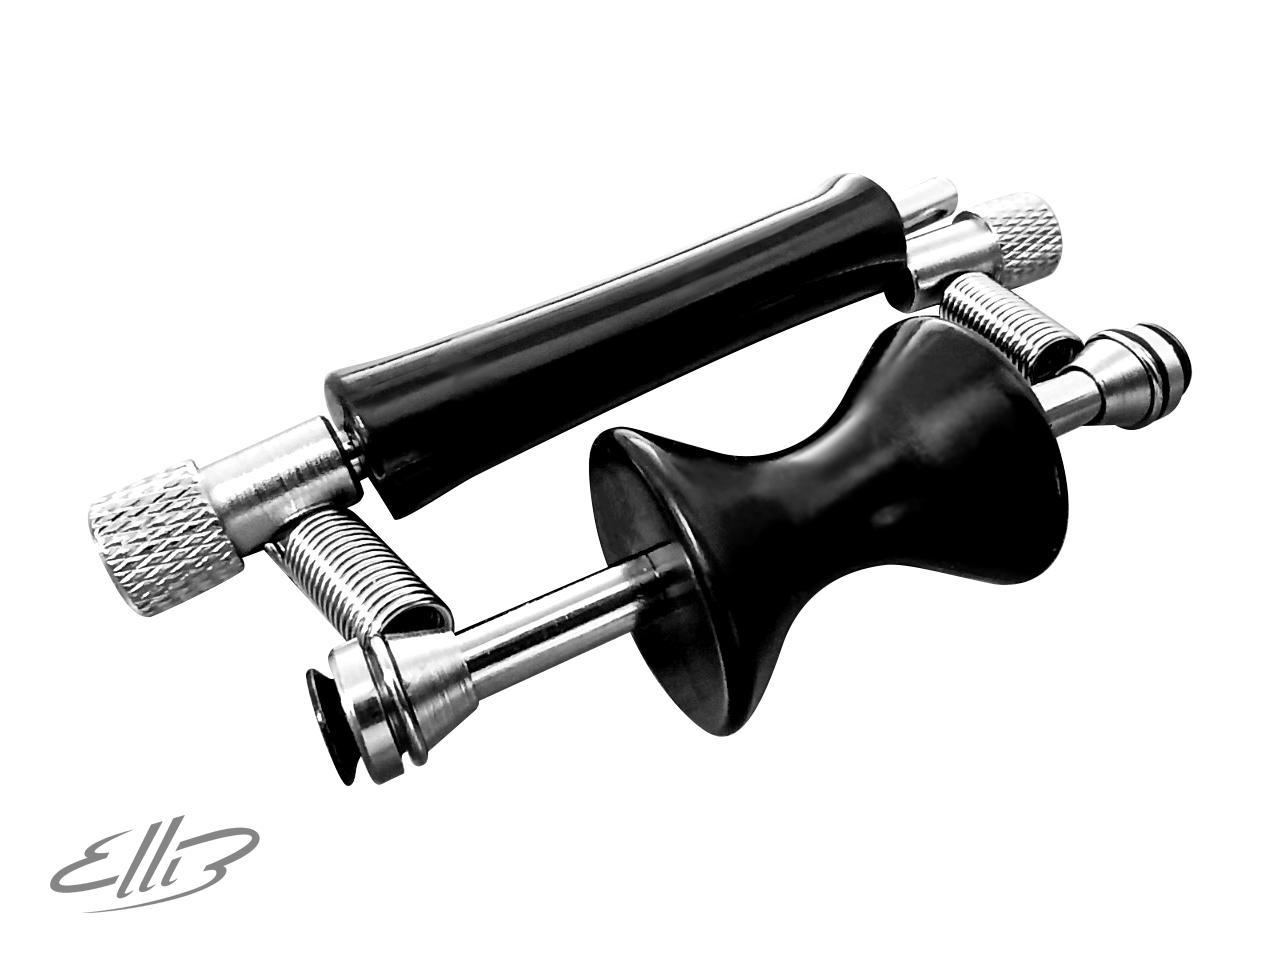 Capo trượt - Capo lăn dành cho guitar Acoustic (Guitar Rolling Capo)